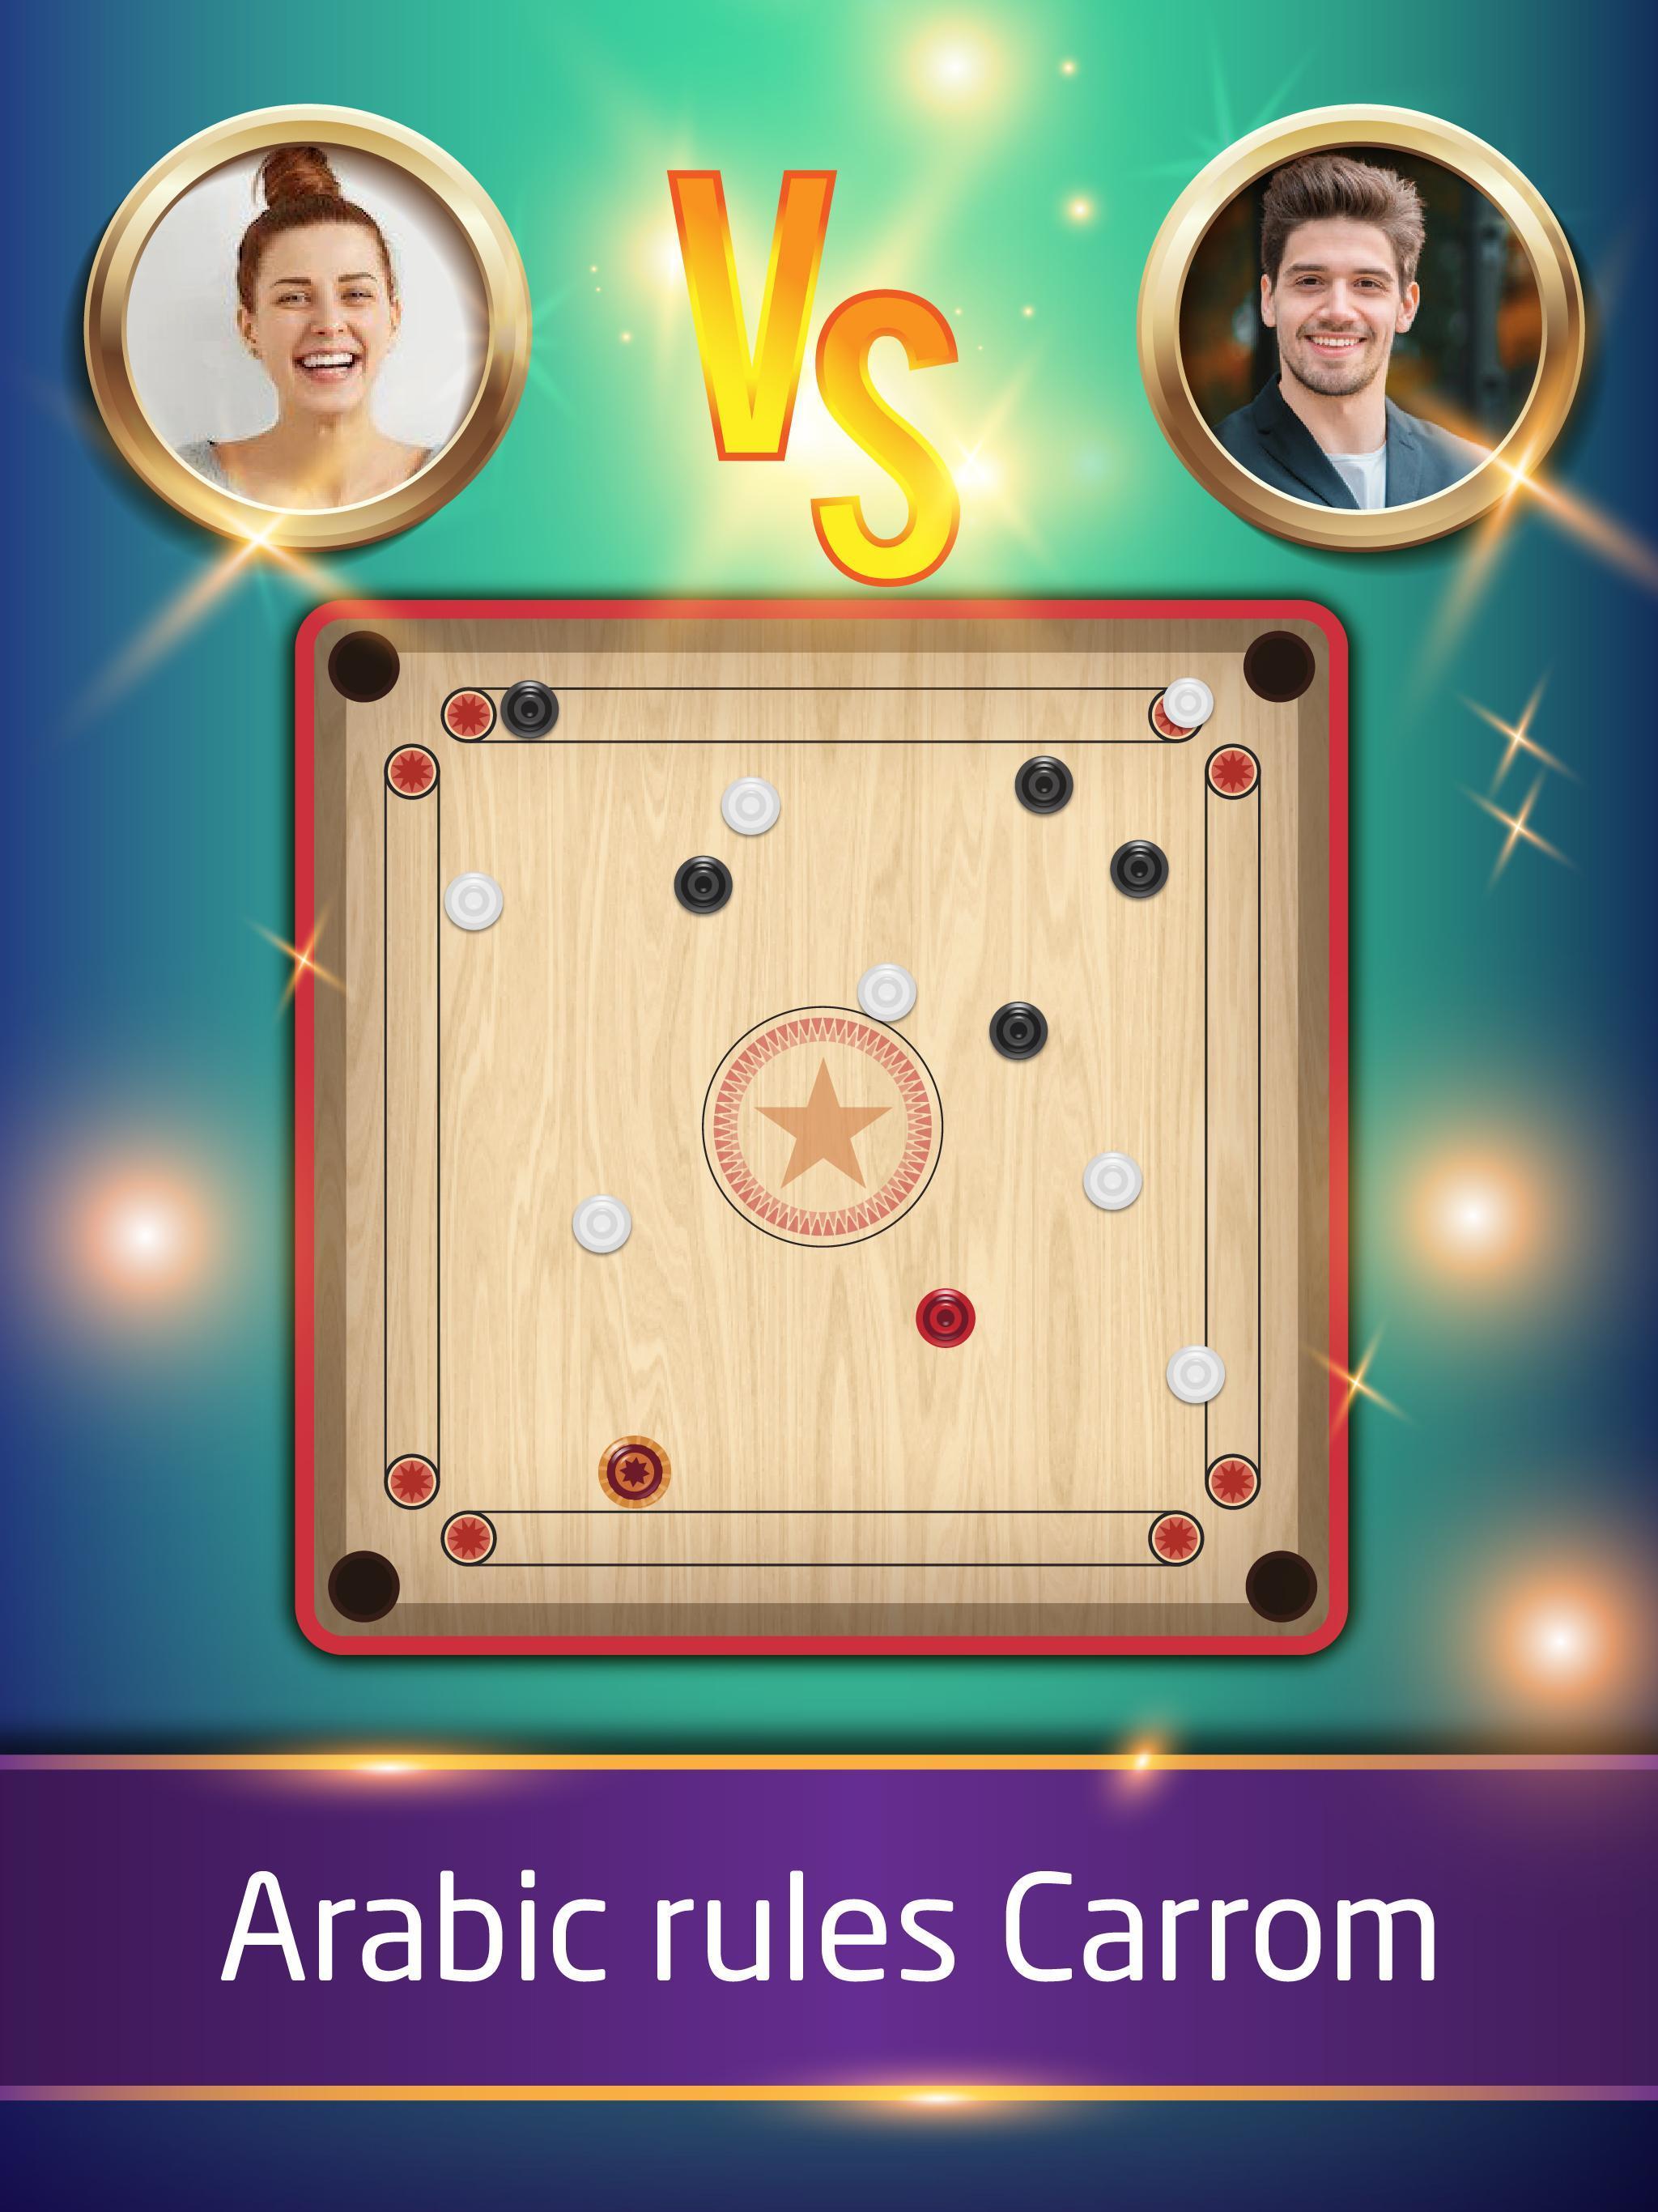 Carrom كيرم - Online pool game 1.8.2 Screenshot 7